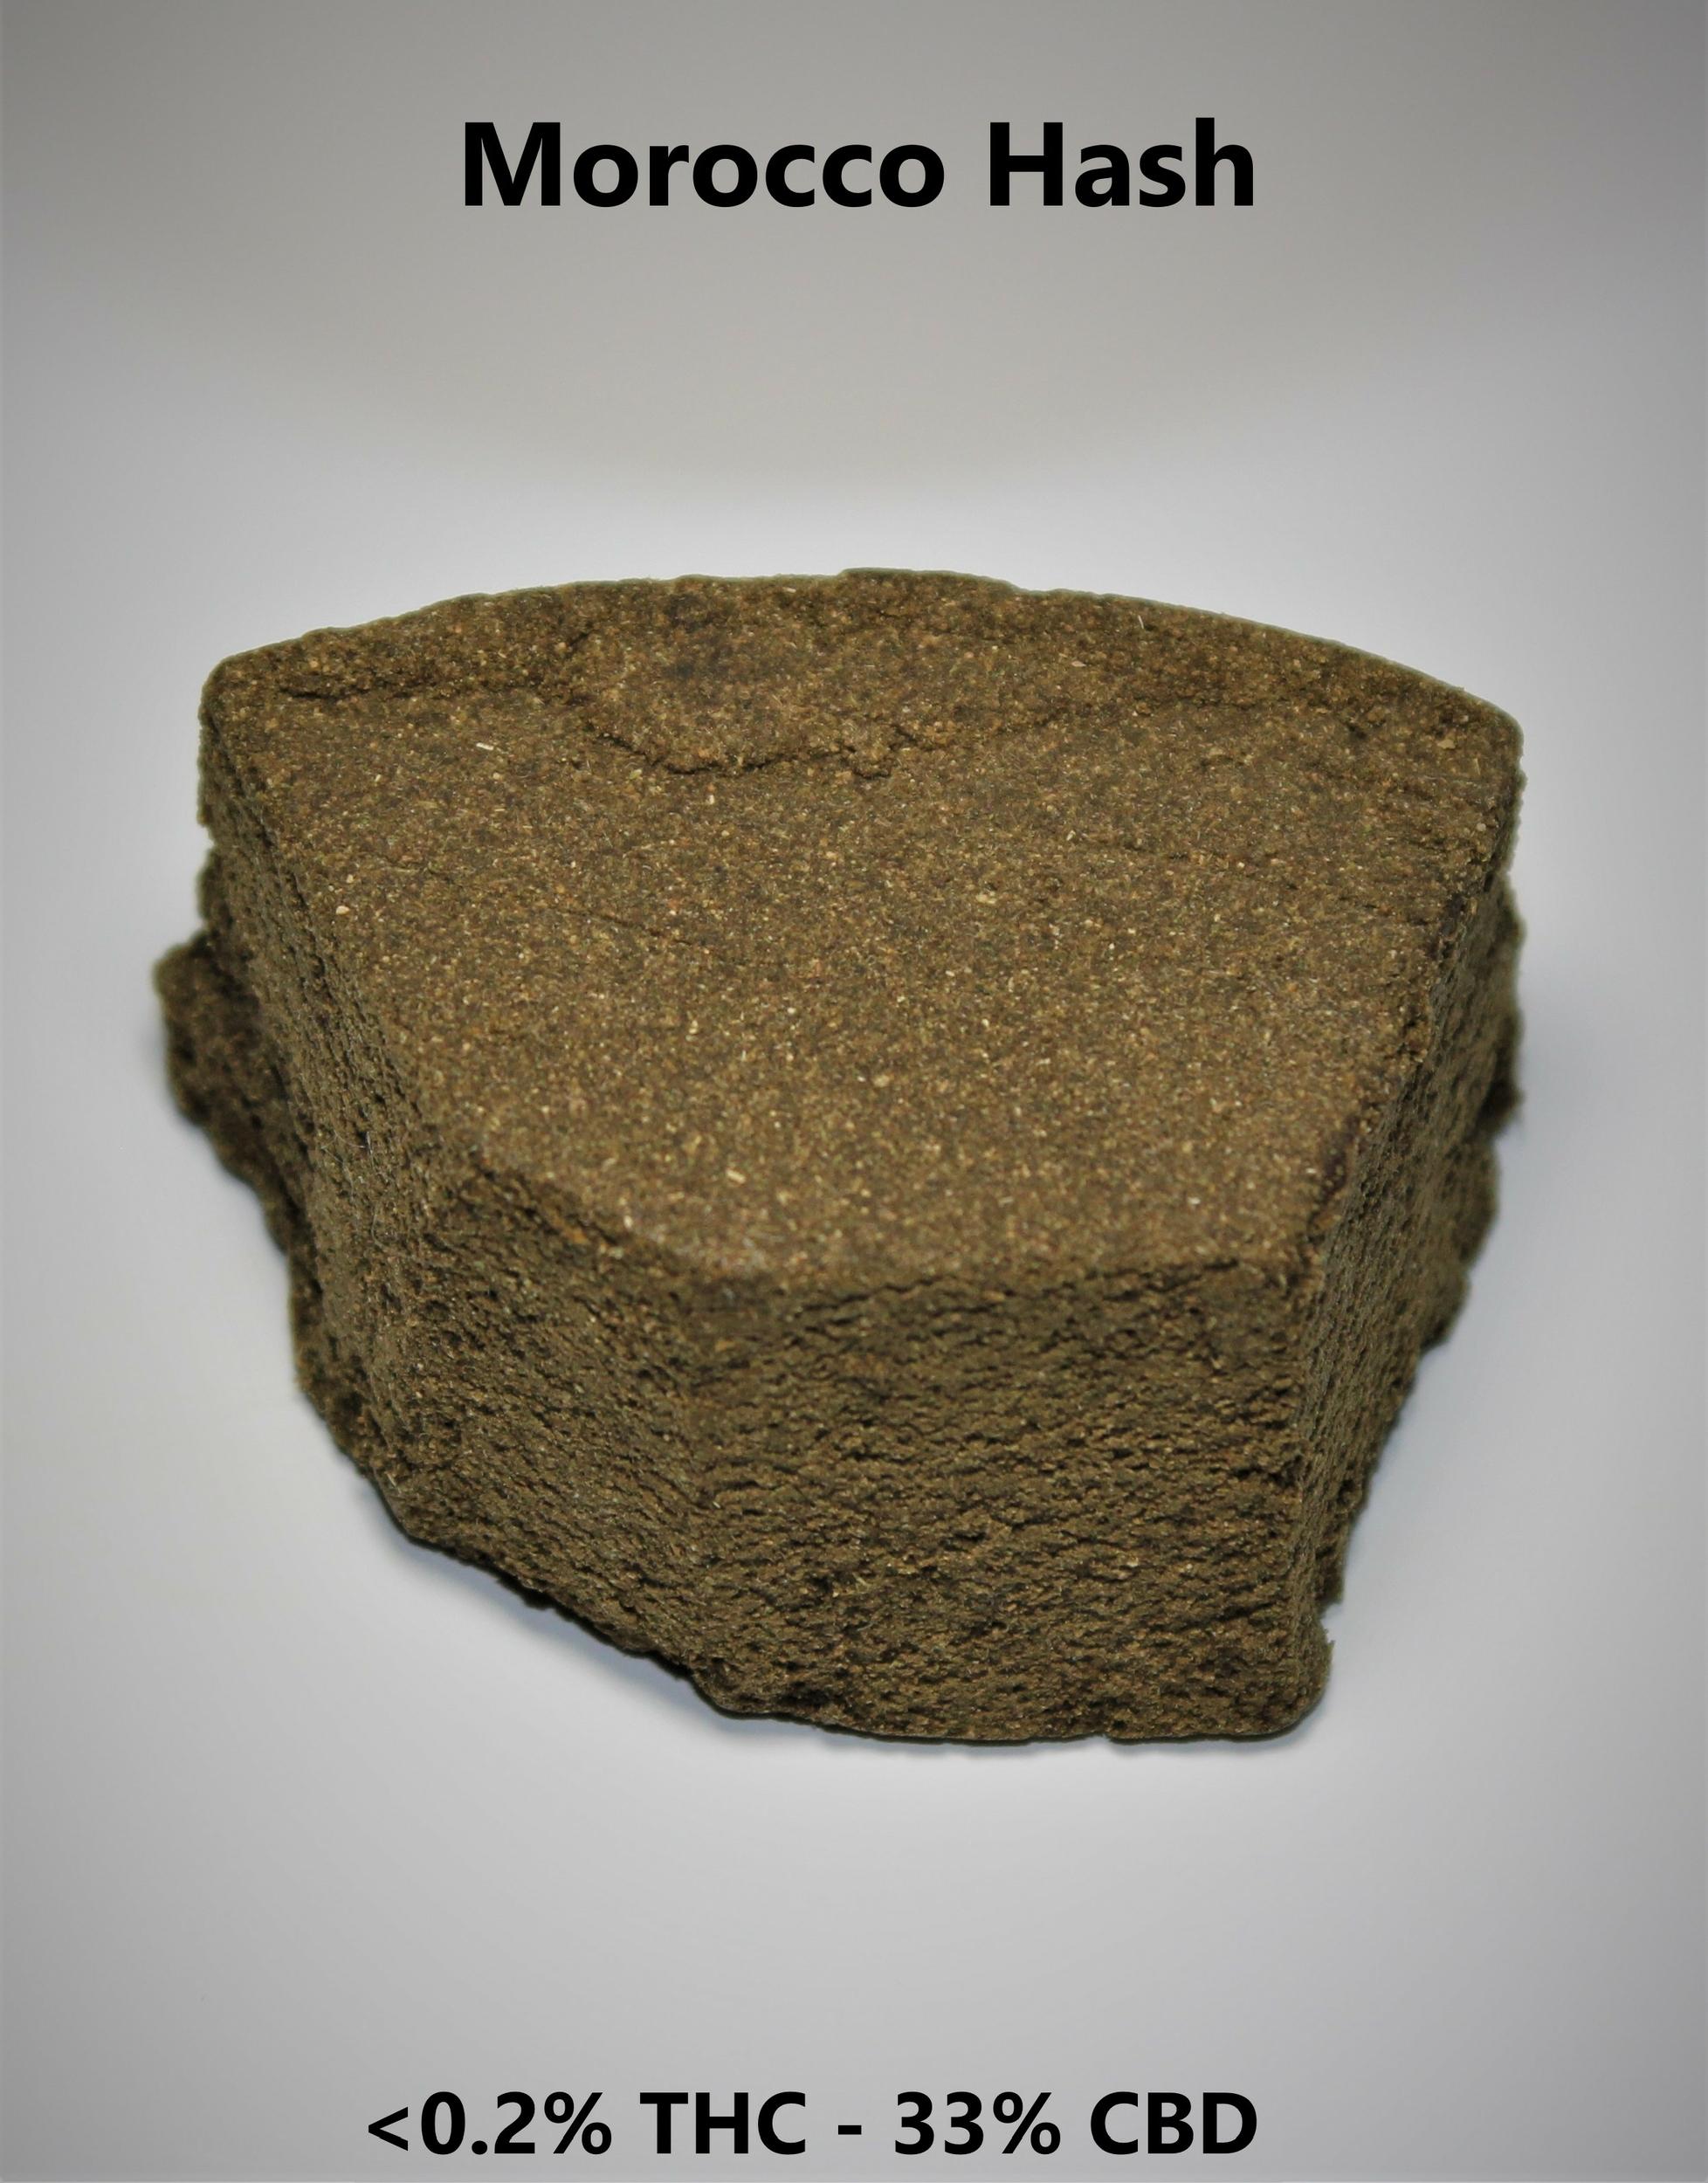 Morocco Hash <0.2% THC - 33% CBD